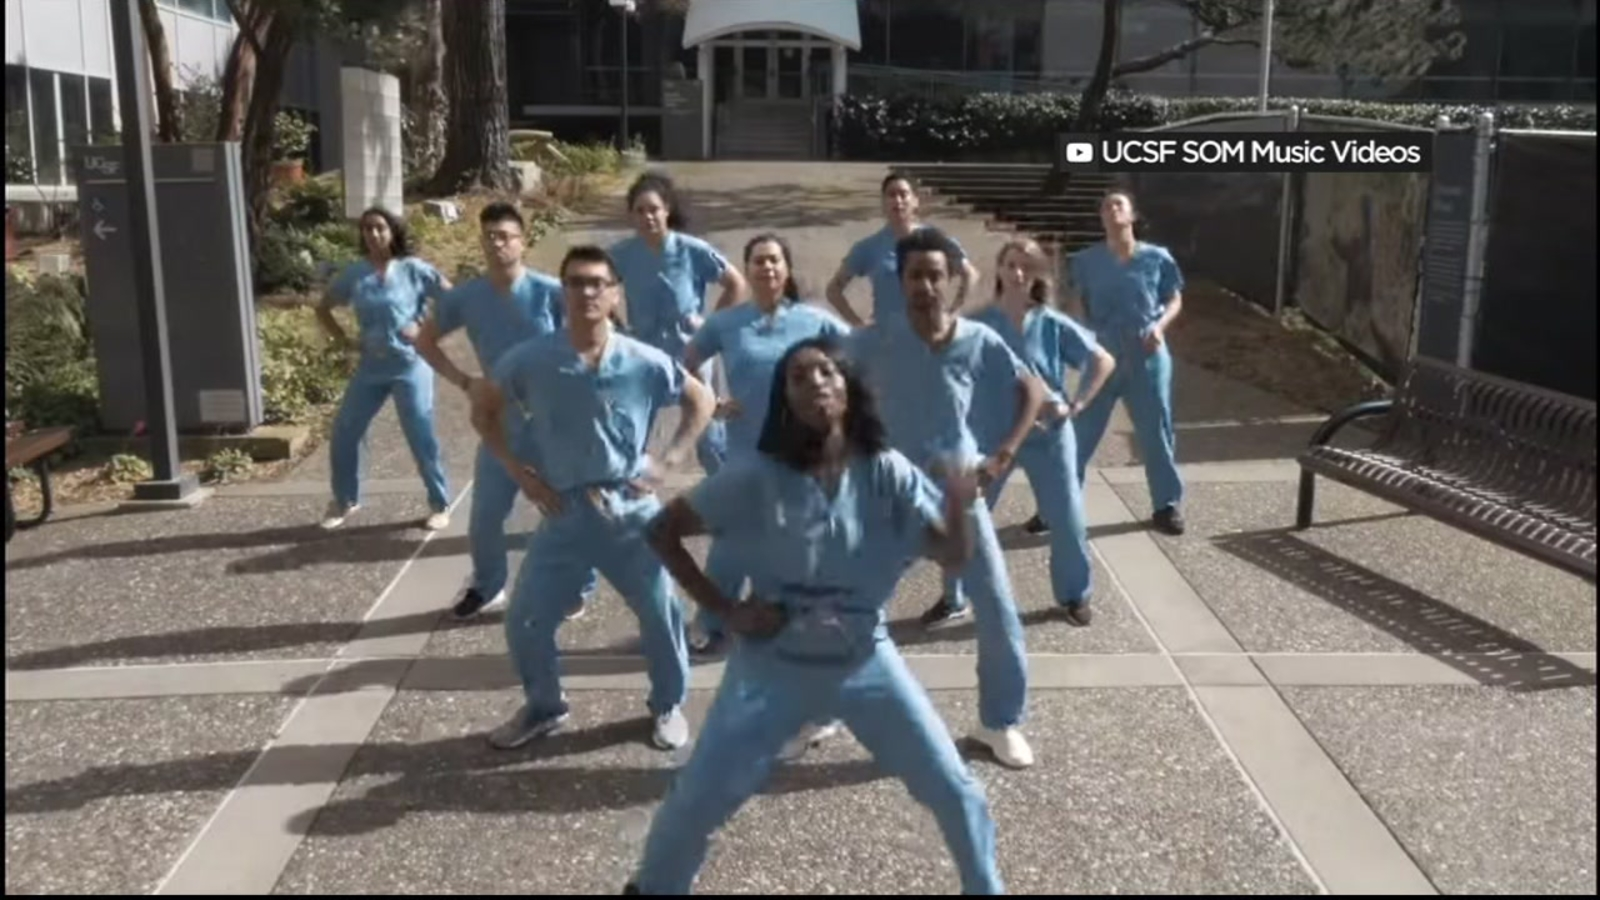 UCSF medical students make an inspiring recruitment video